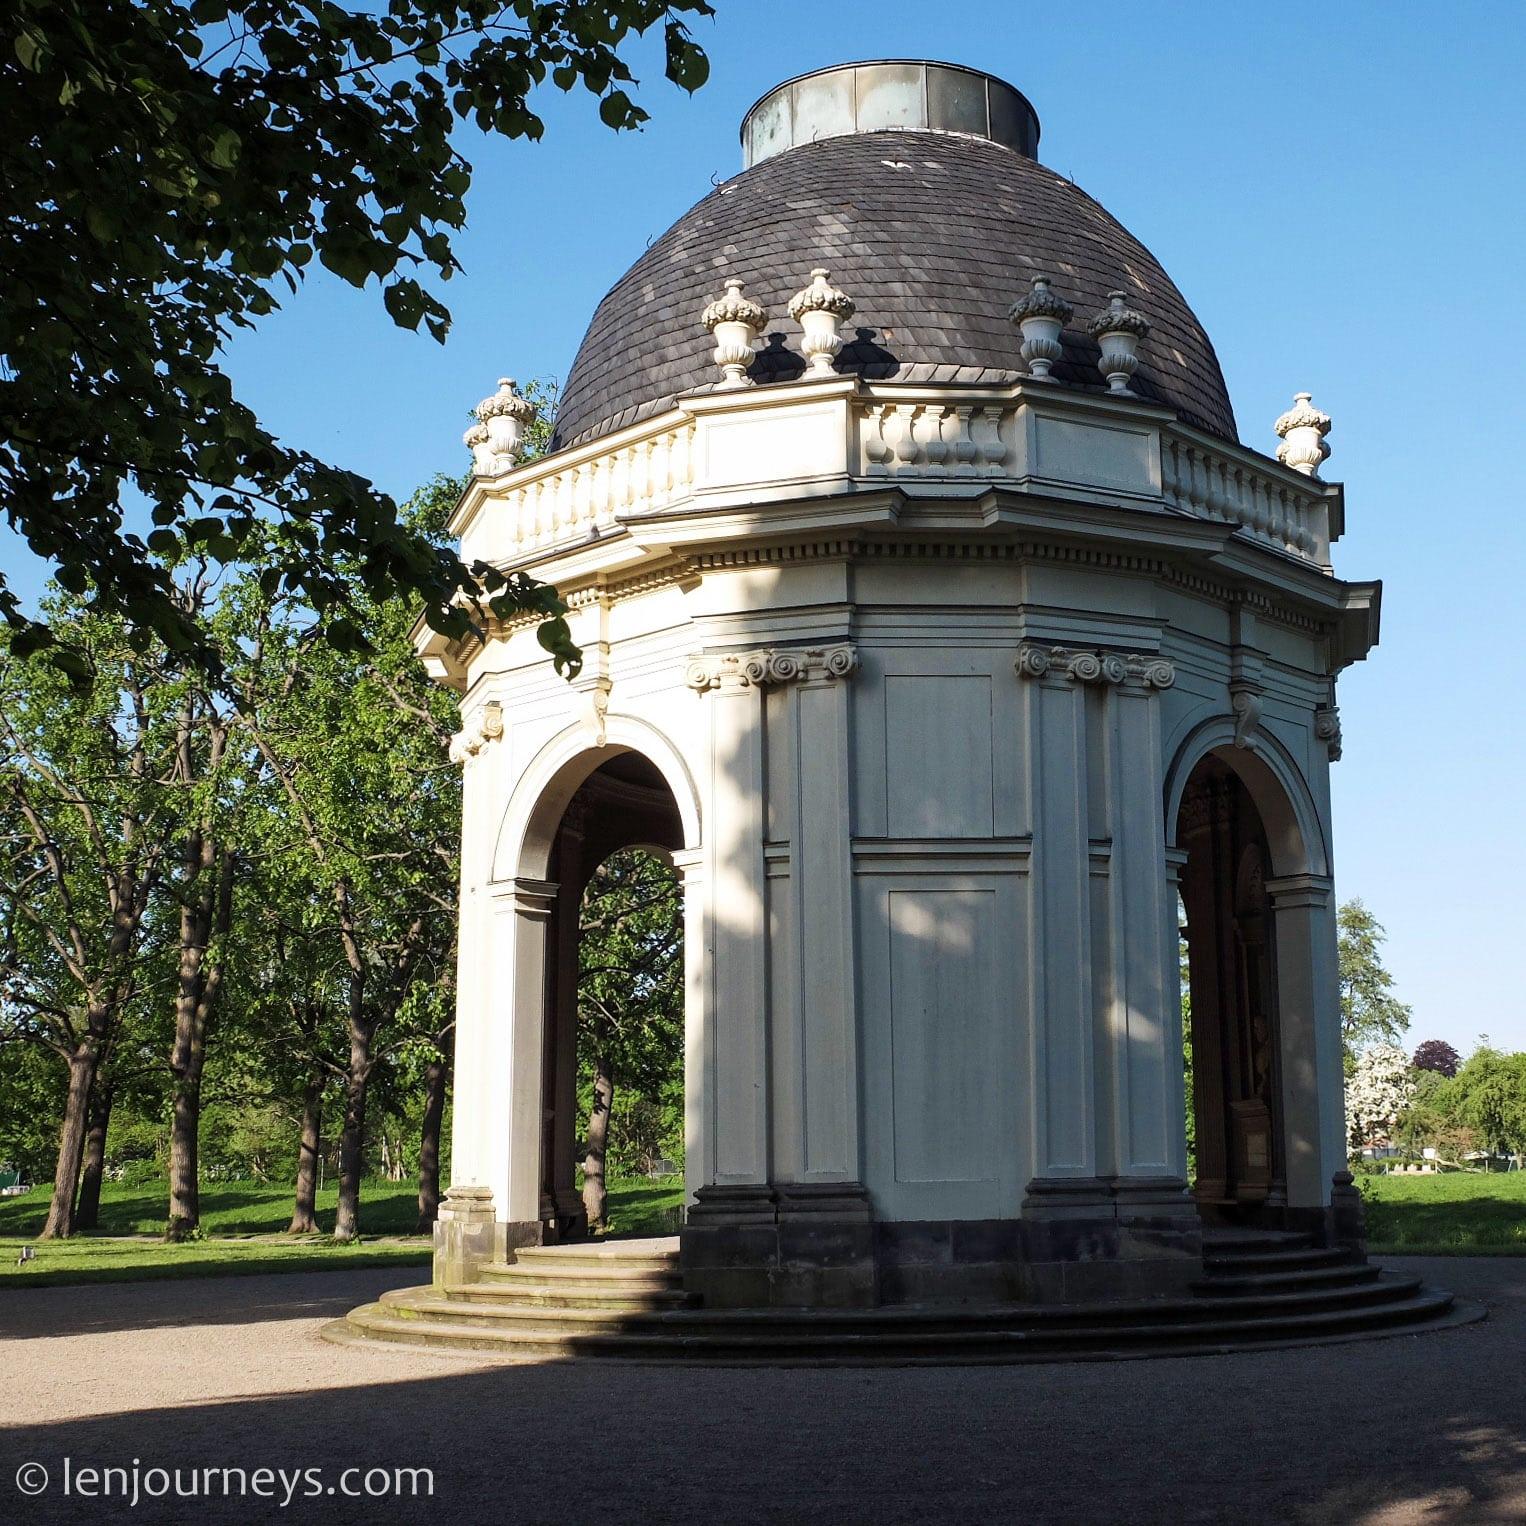 Temple of Love in Herrenhause Gardens